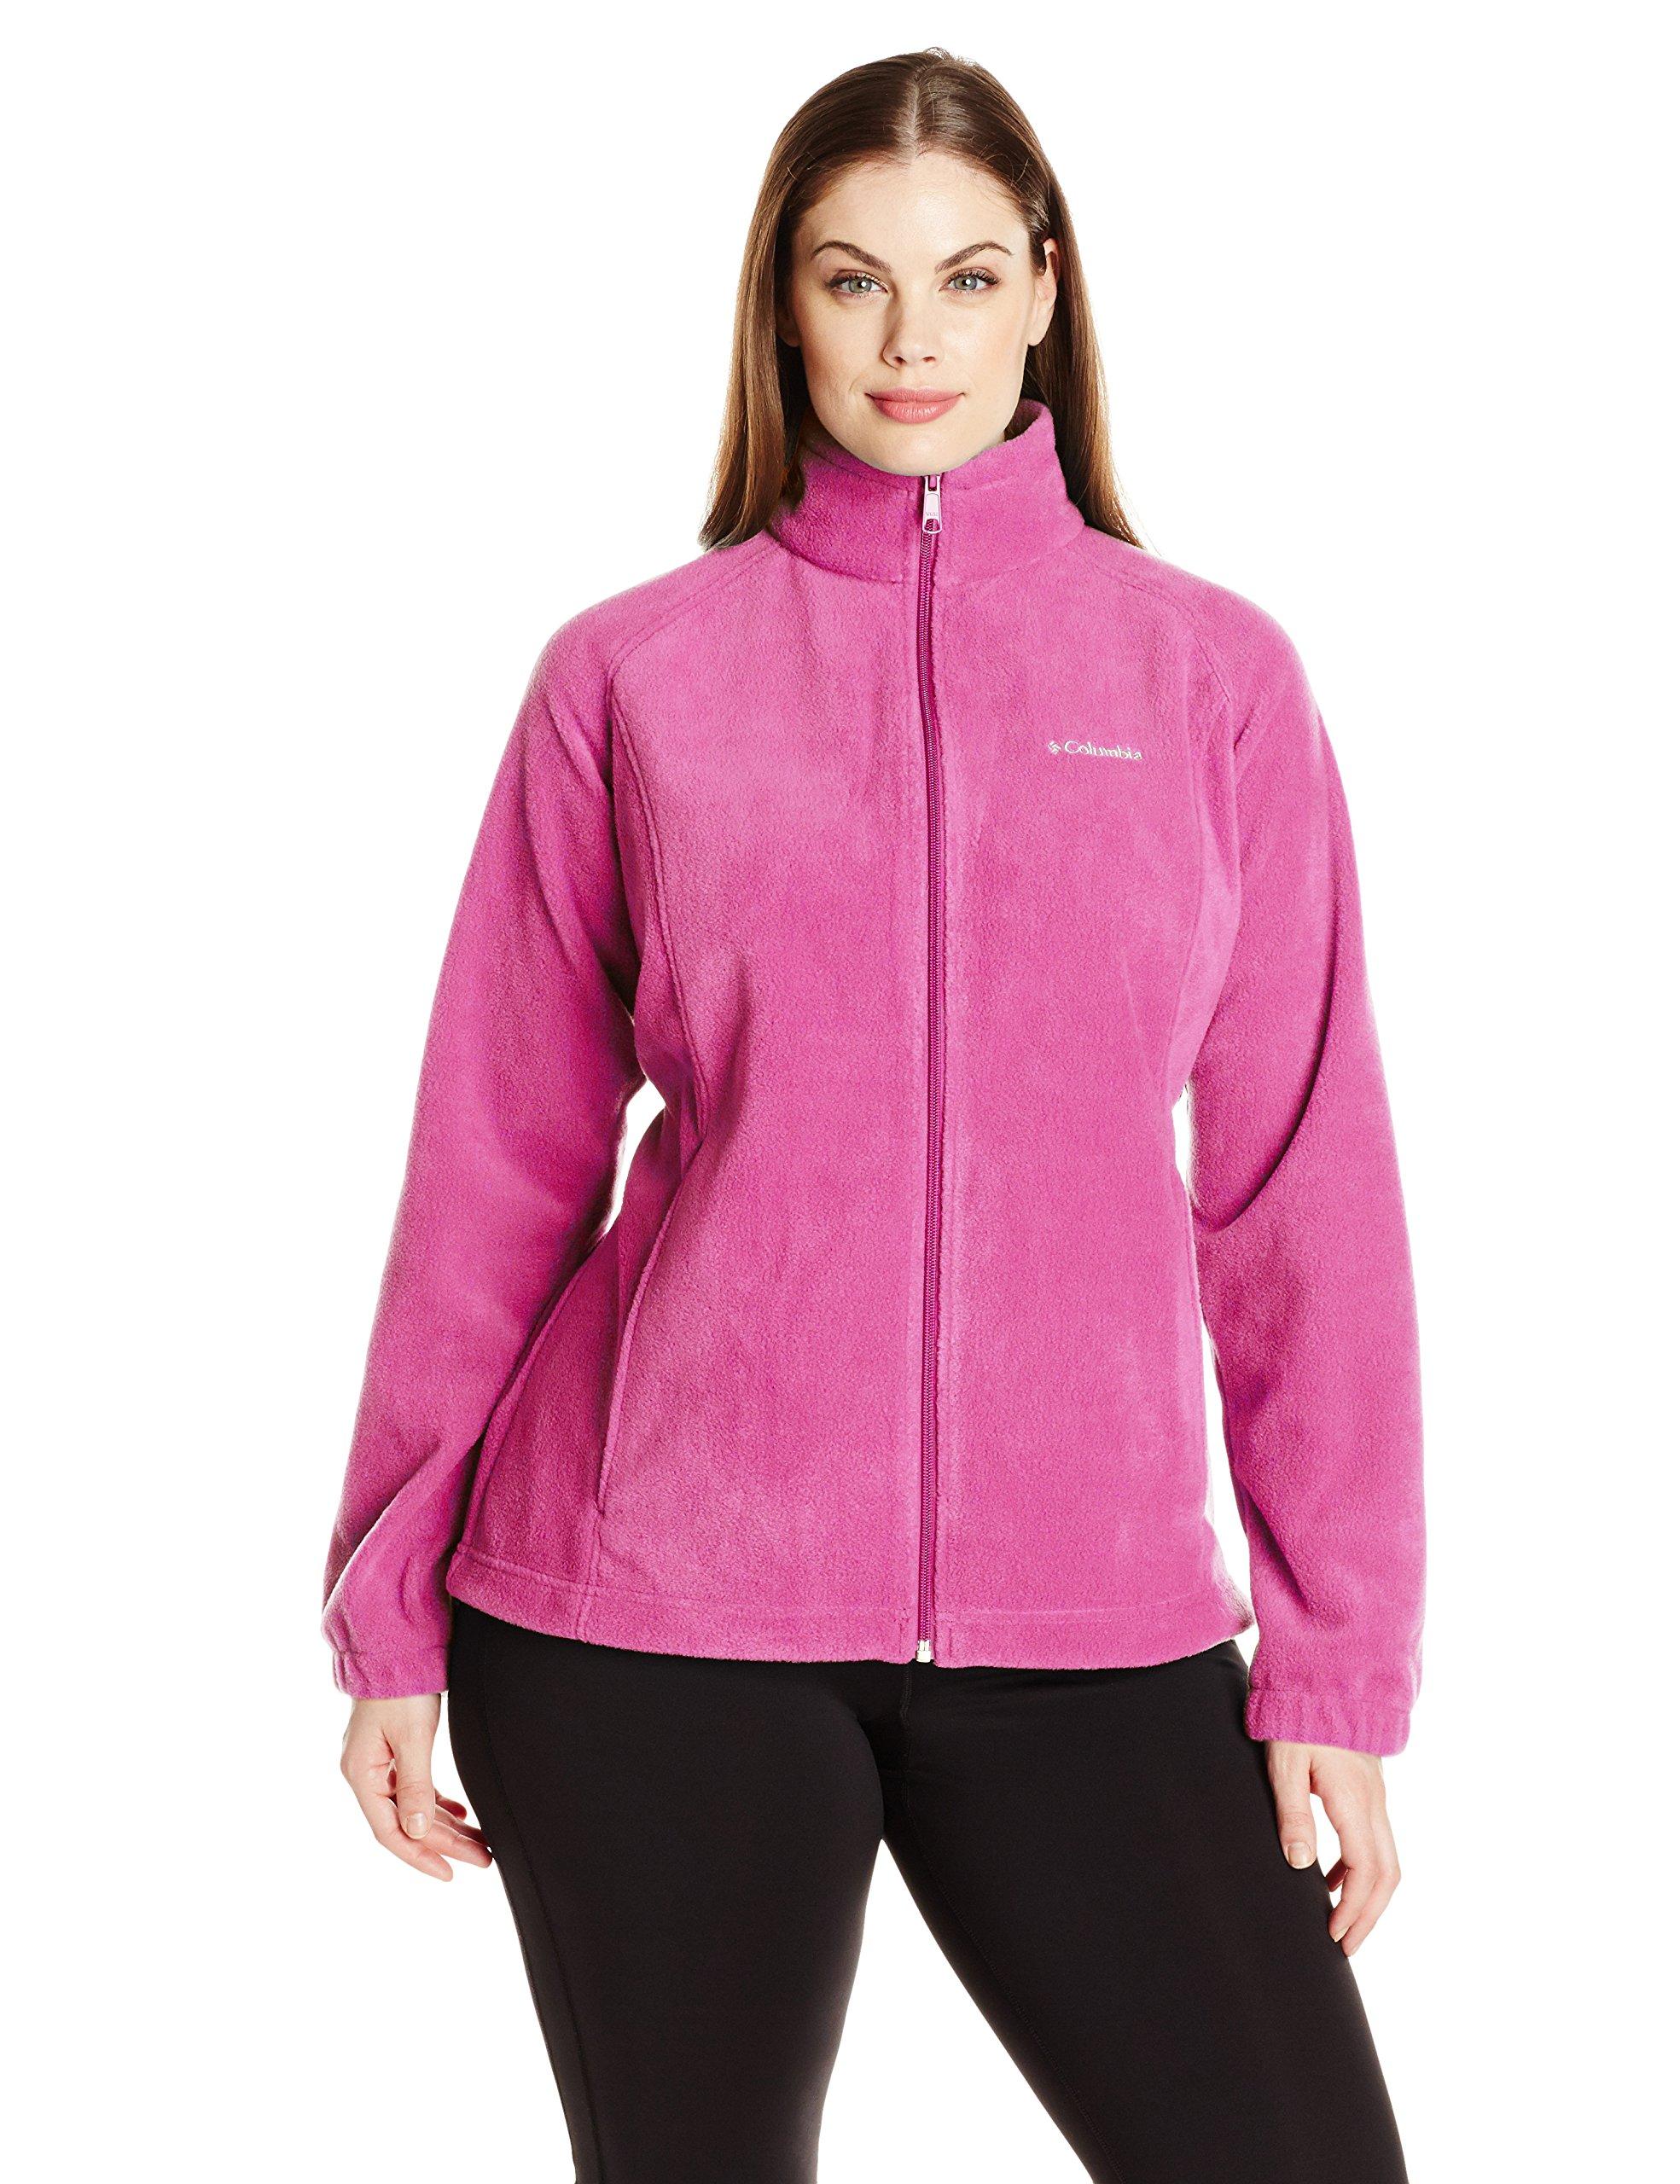 cc2b4d85156 Columbia Women s Plus-Size Benton Springs Full-Zip Fleece Jacket product  image